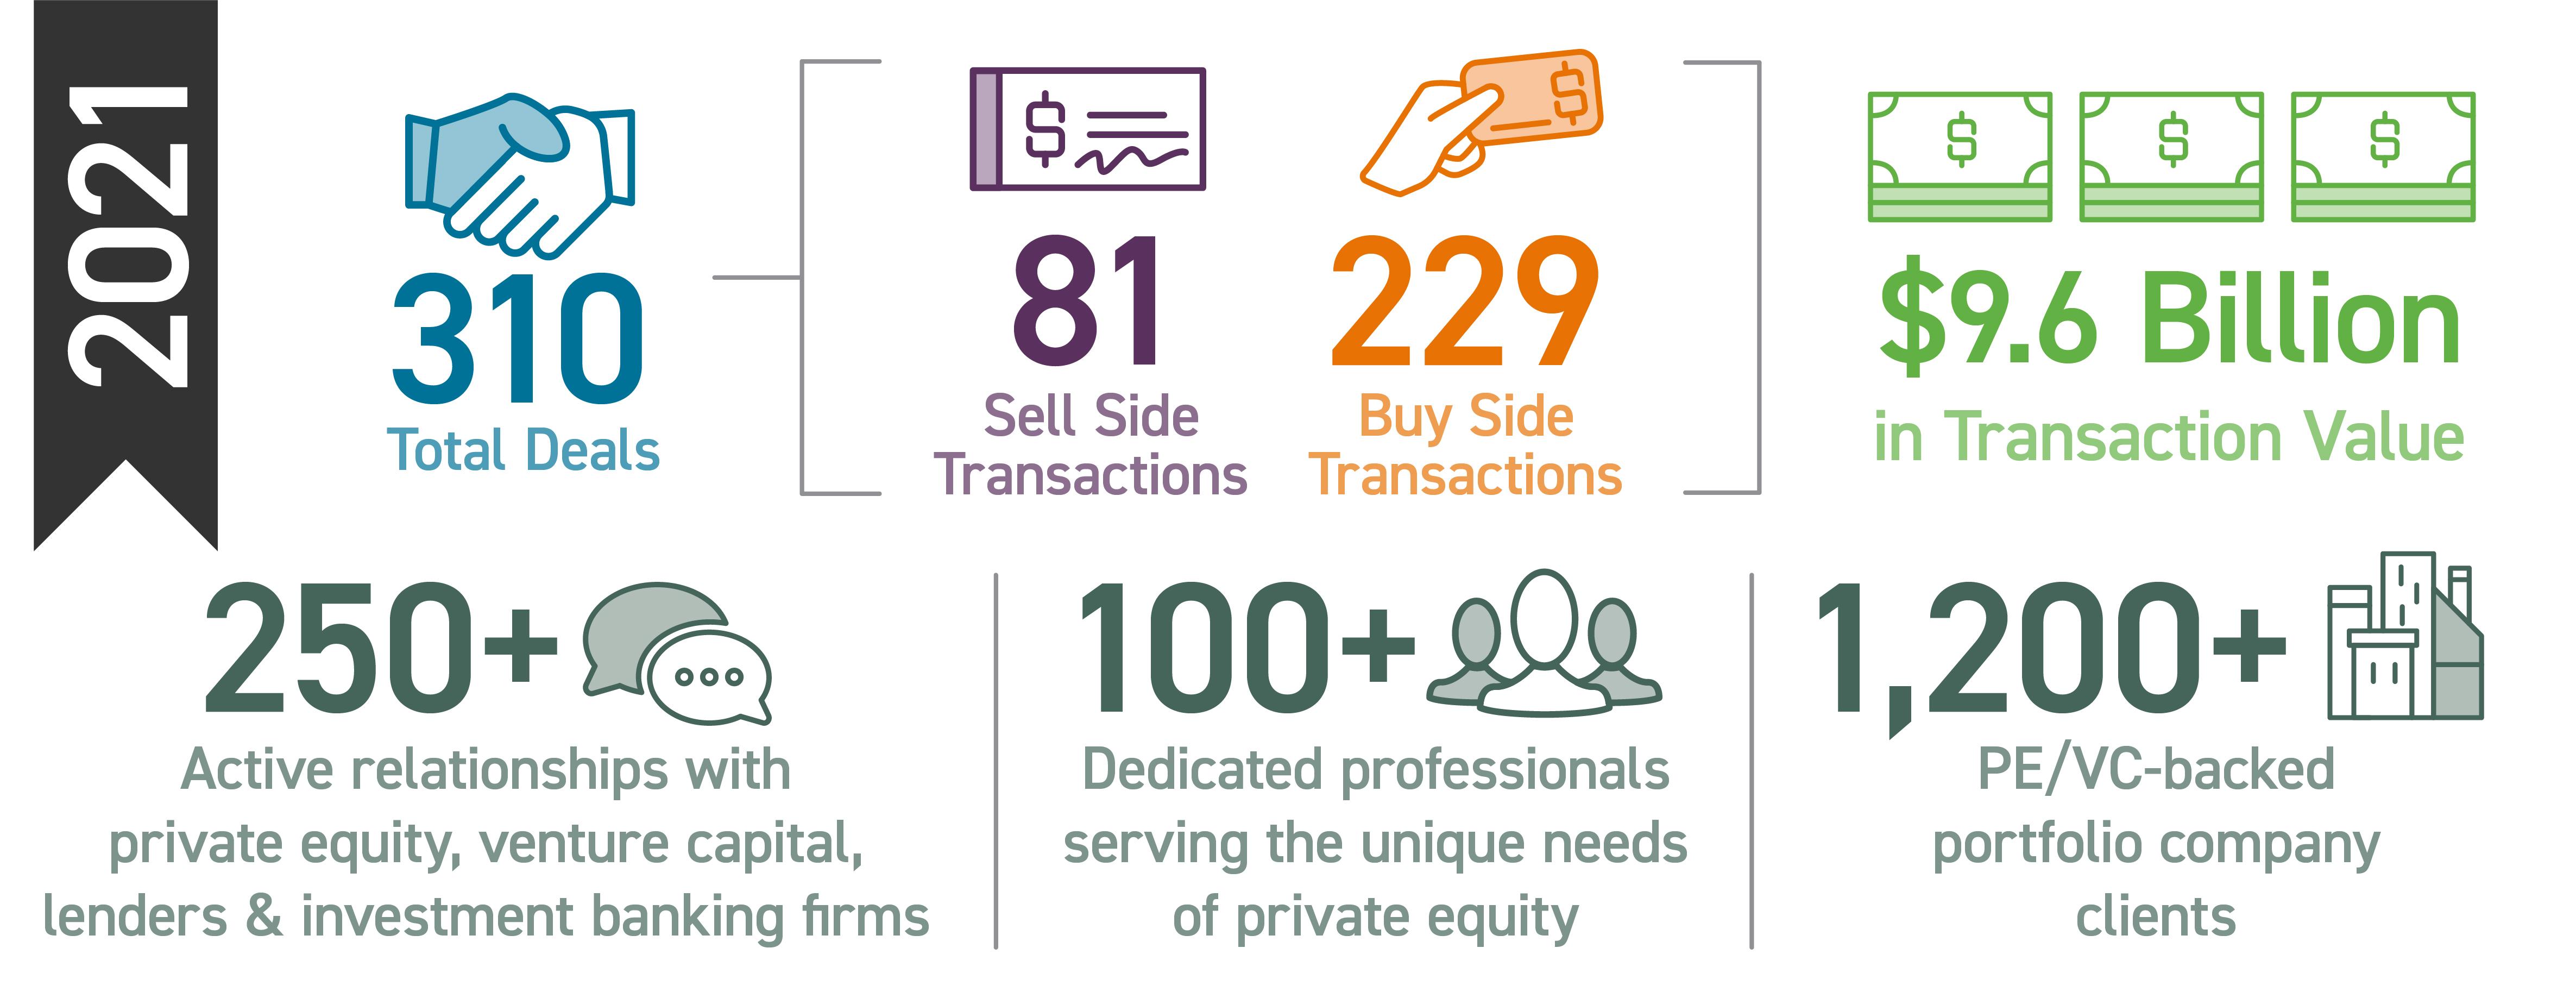 transaction advisory services client stats